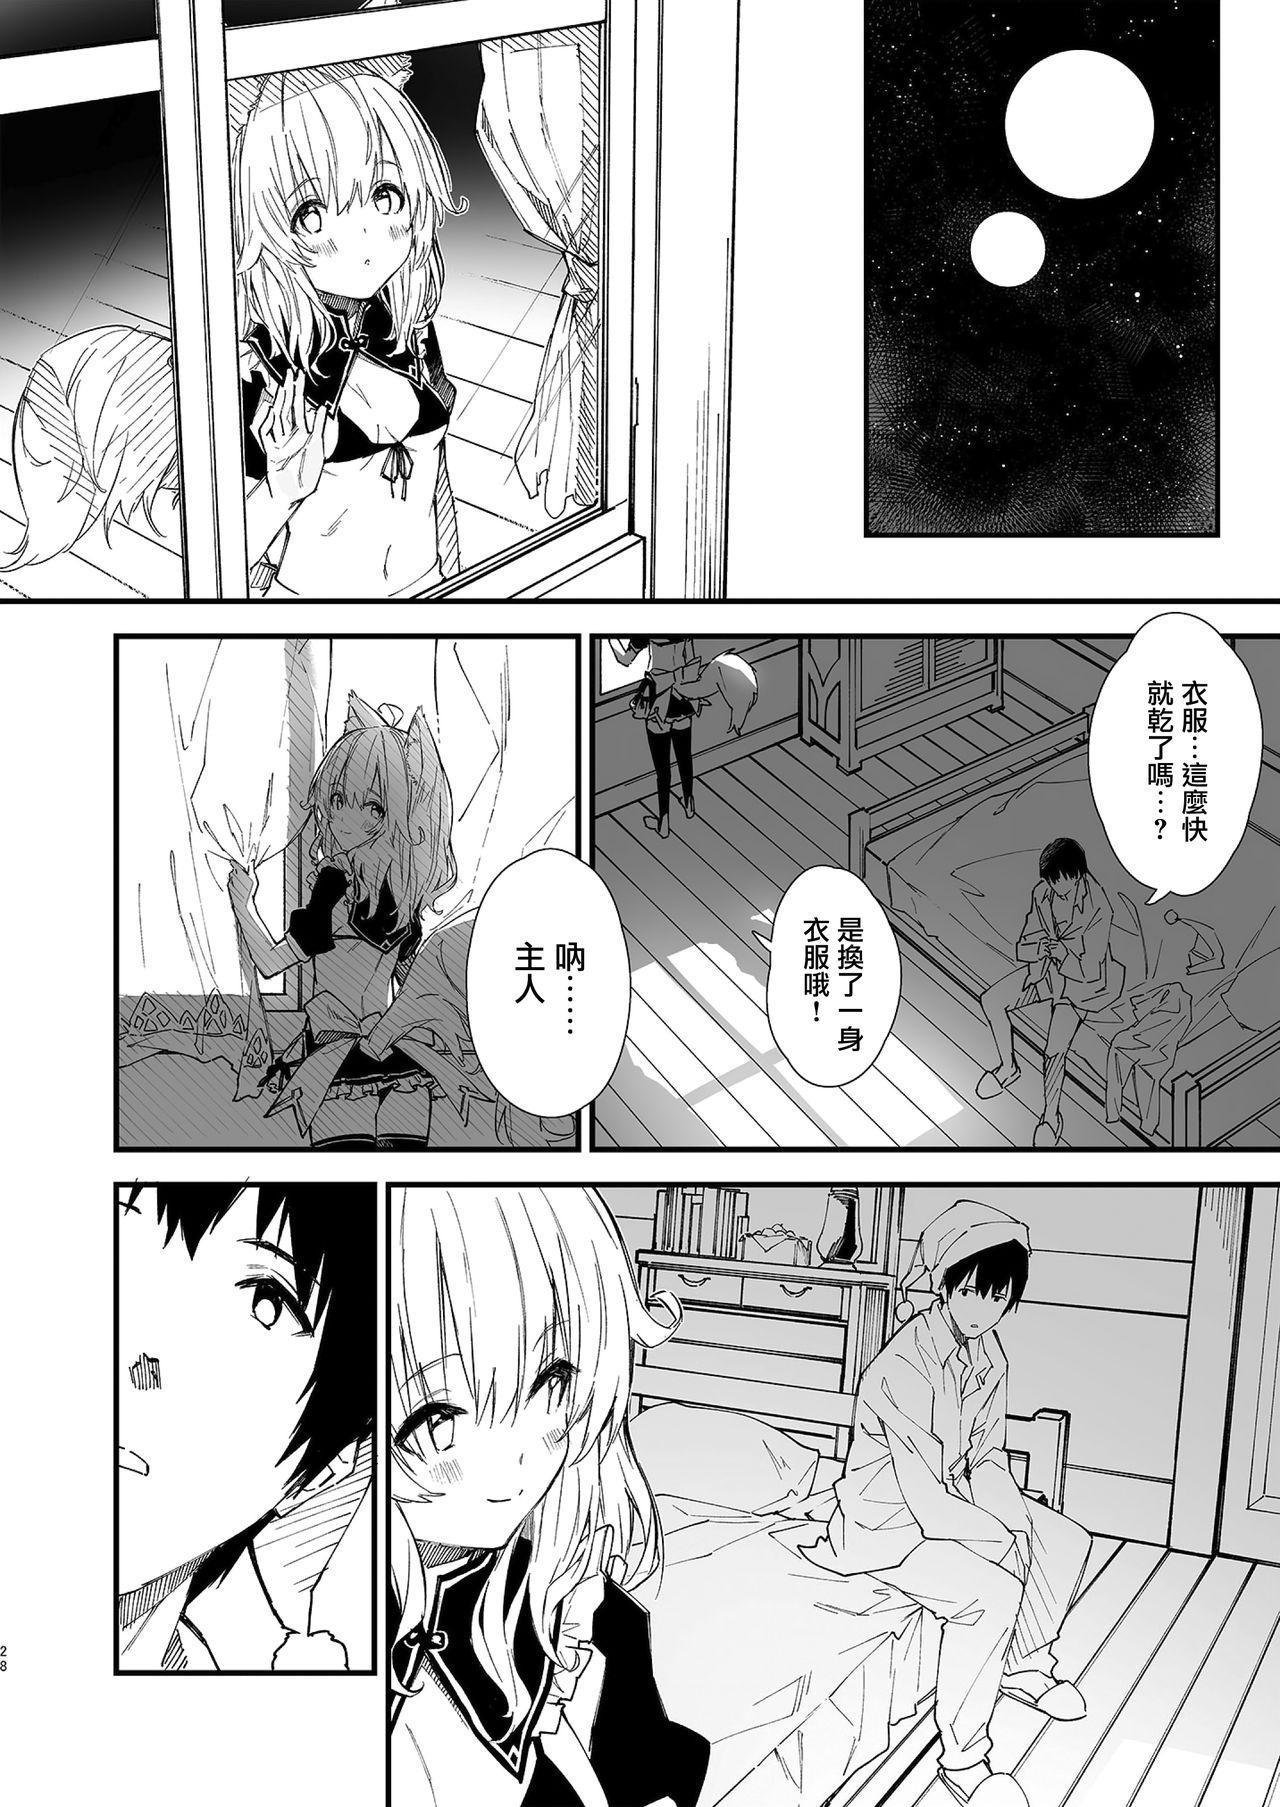 Kemomimi Maid to Ichaicha suru Hon 26